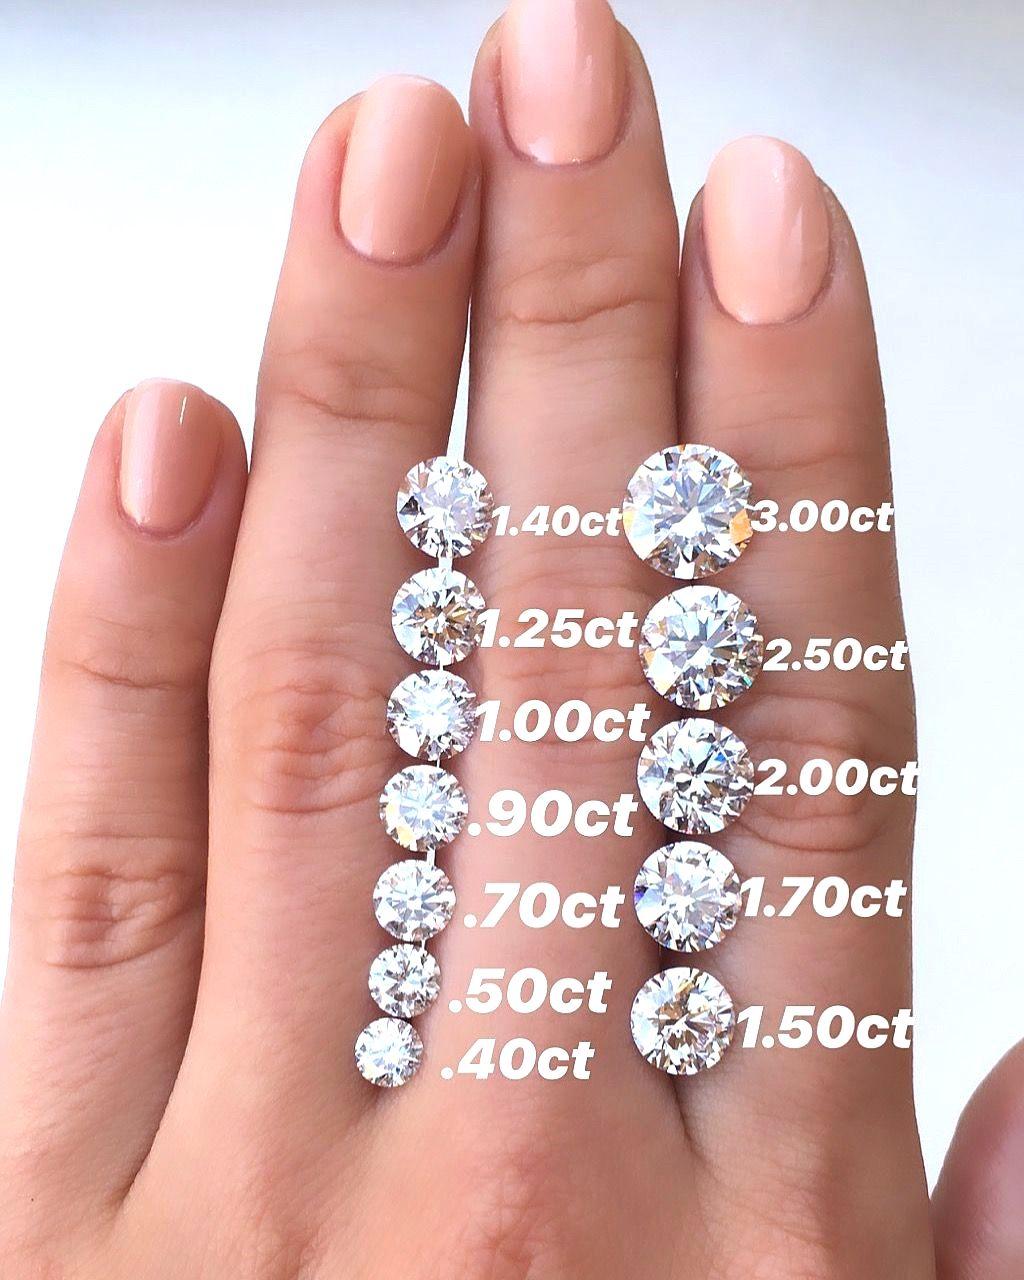 Den And Dana Design Lab Grown Diamonds New York City Ken And Dana Wedding Band White Gold Lab Diamond Wedding Sets Lab Created Diamond Rings Wedding Ring Sets